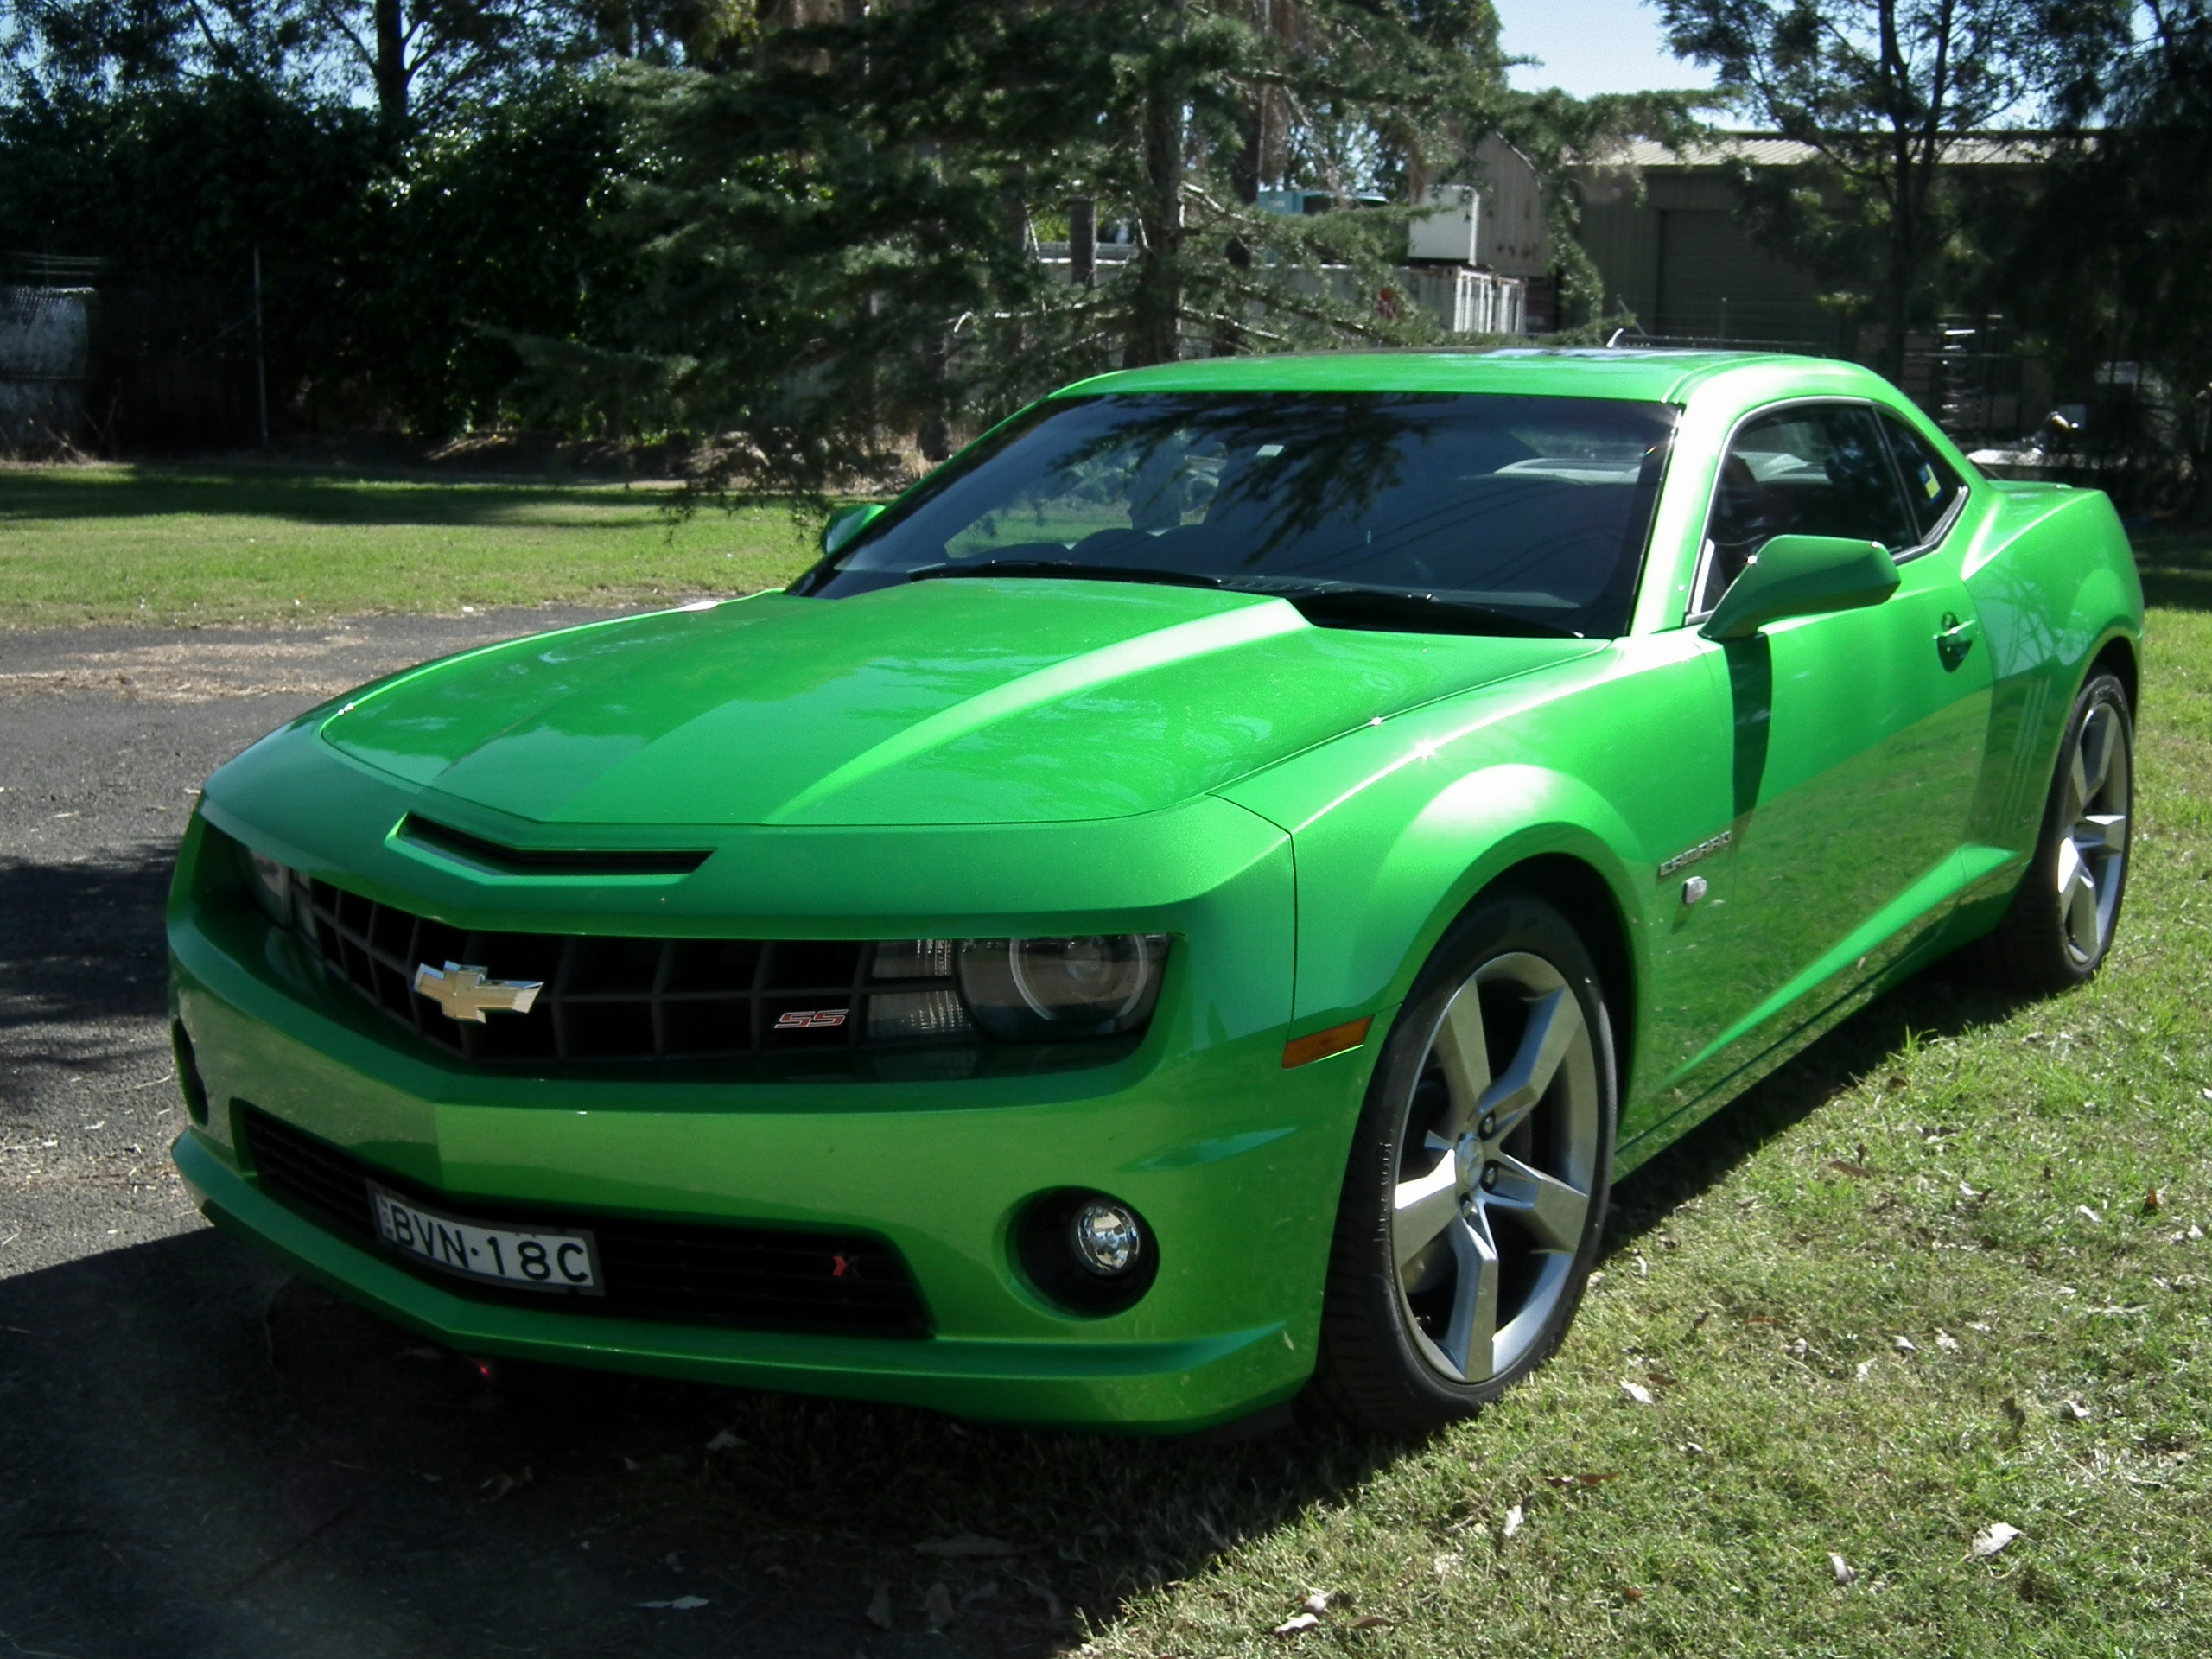 Image Result For Green Chevrolet